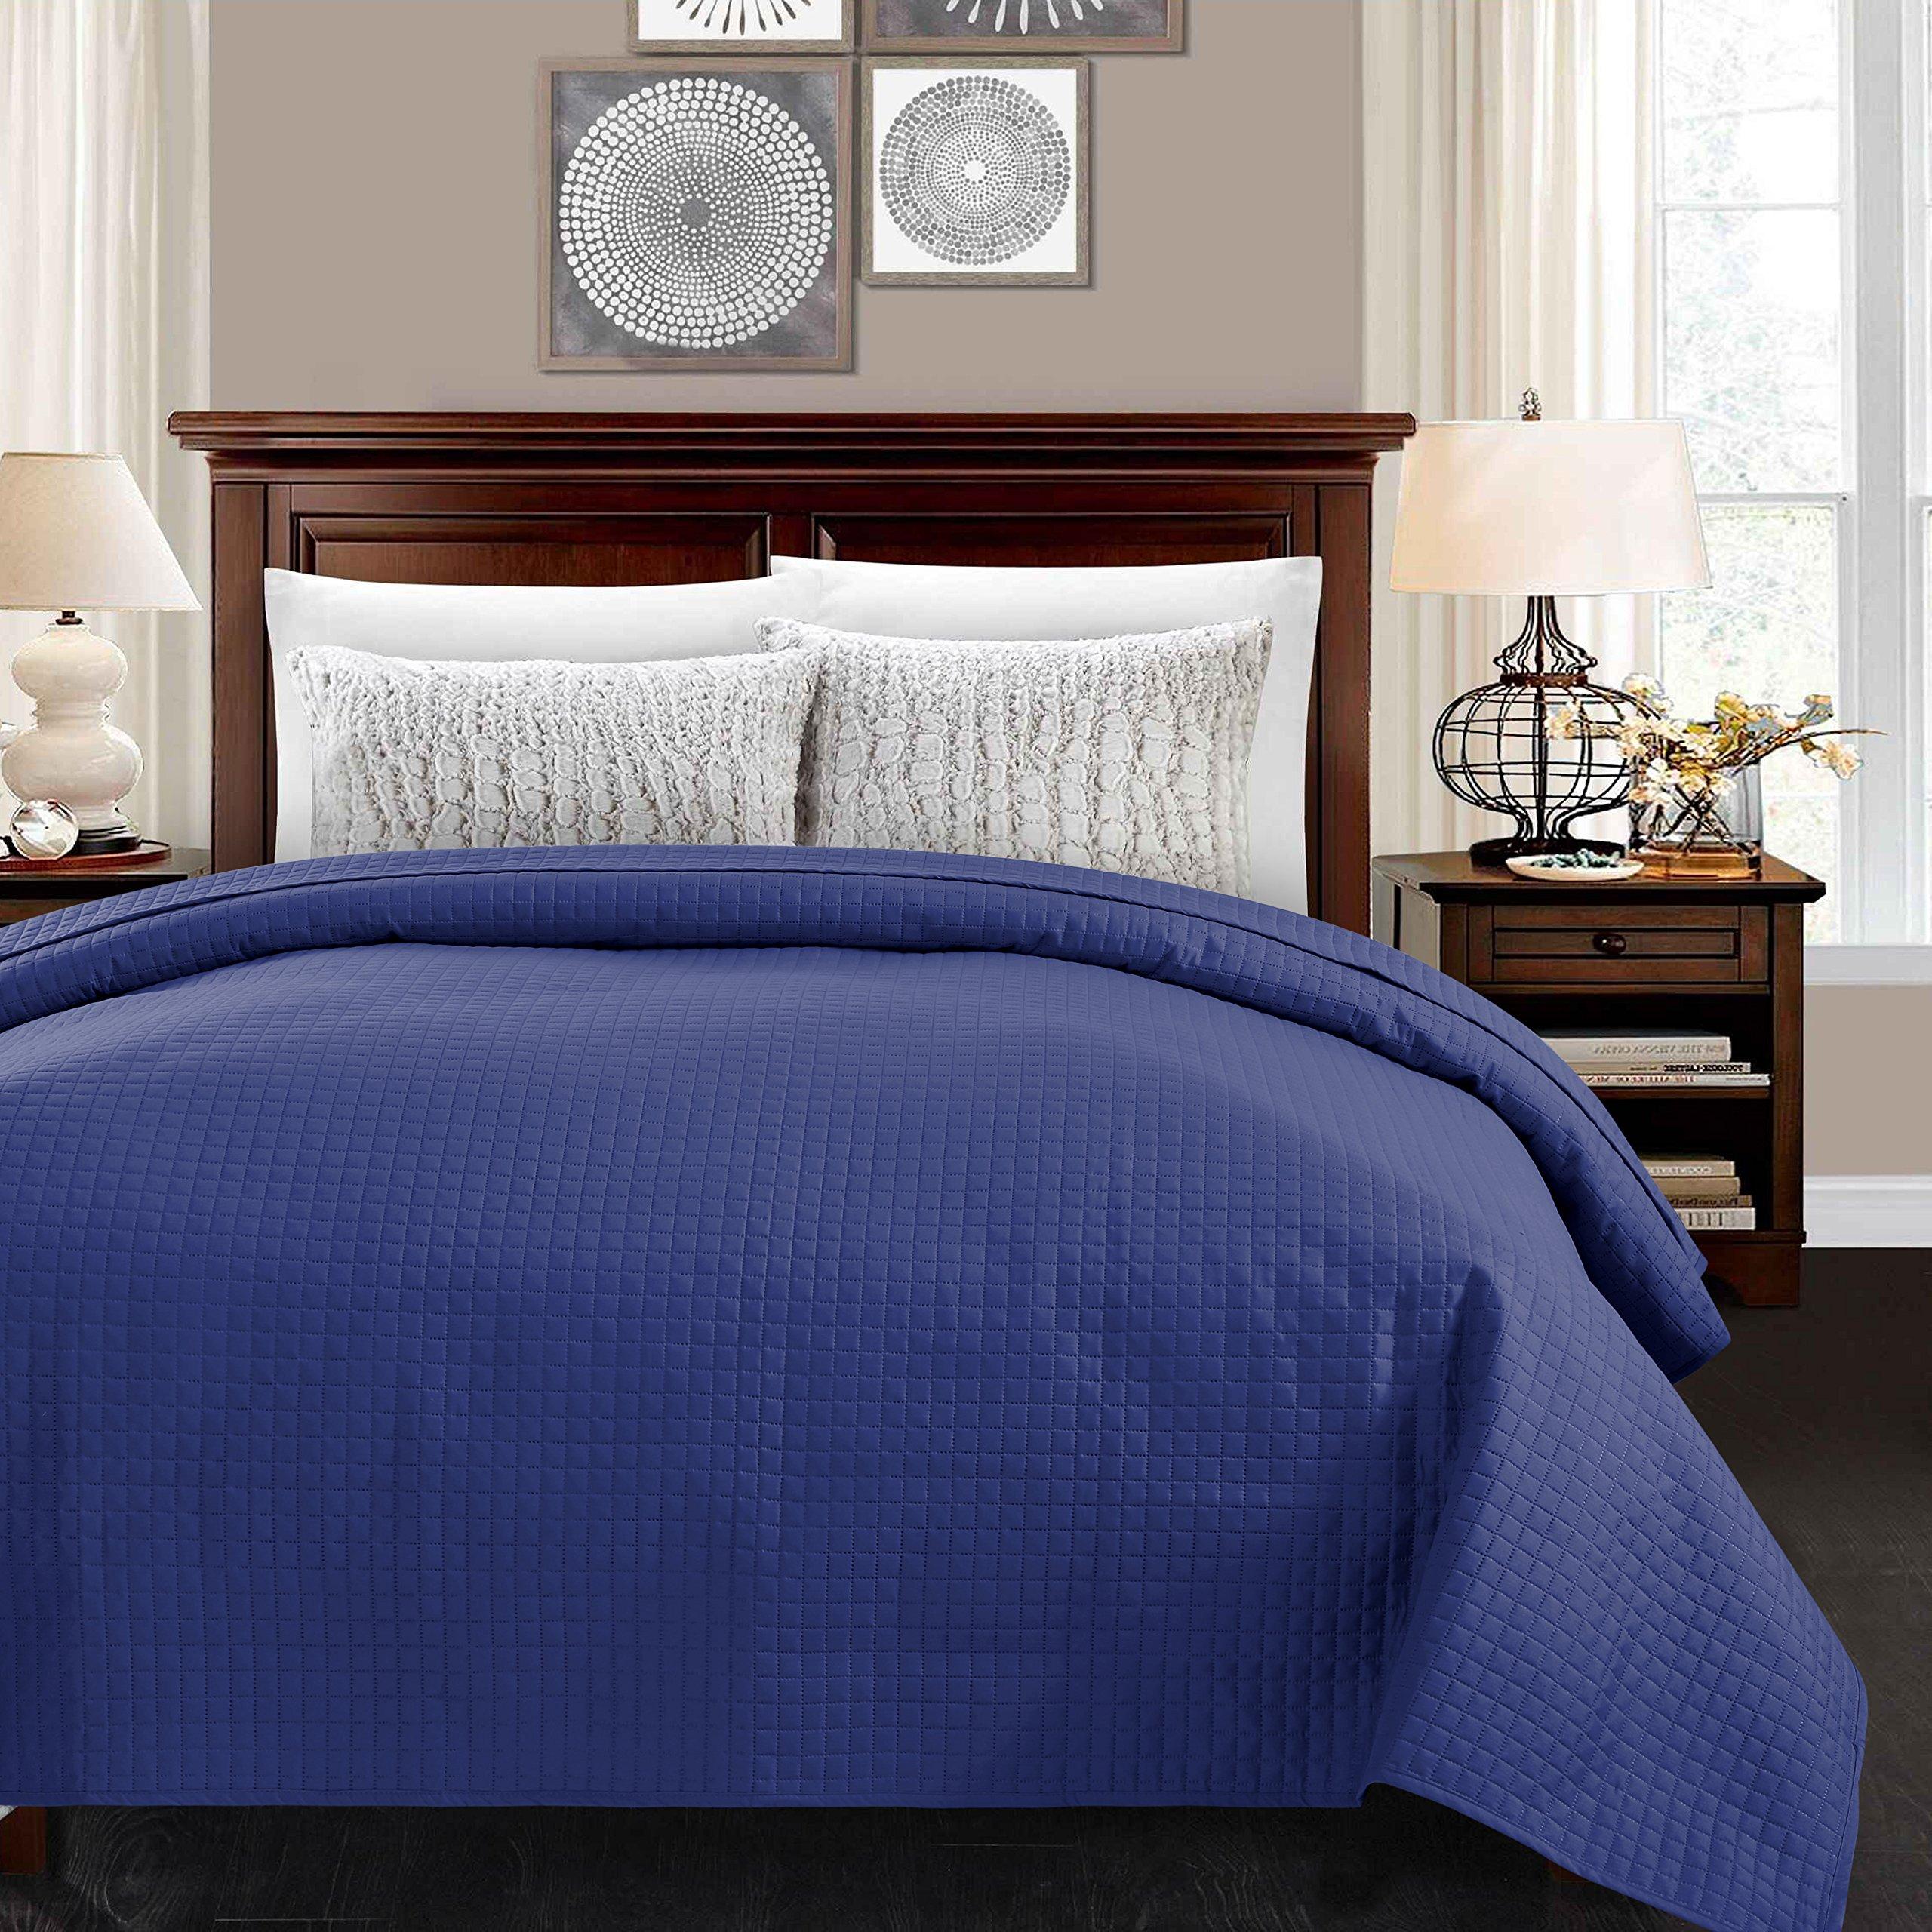 ALPHA HOME Lightweight Bedspread Queen Size Summer Blanket Bed Quilt, Blue by ALPHA HOME